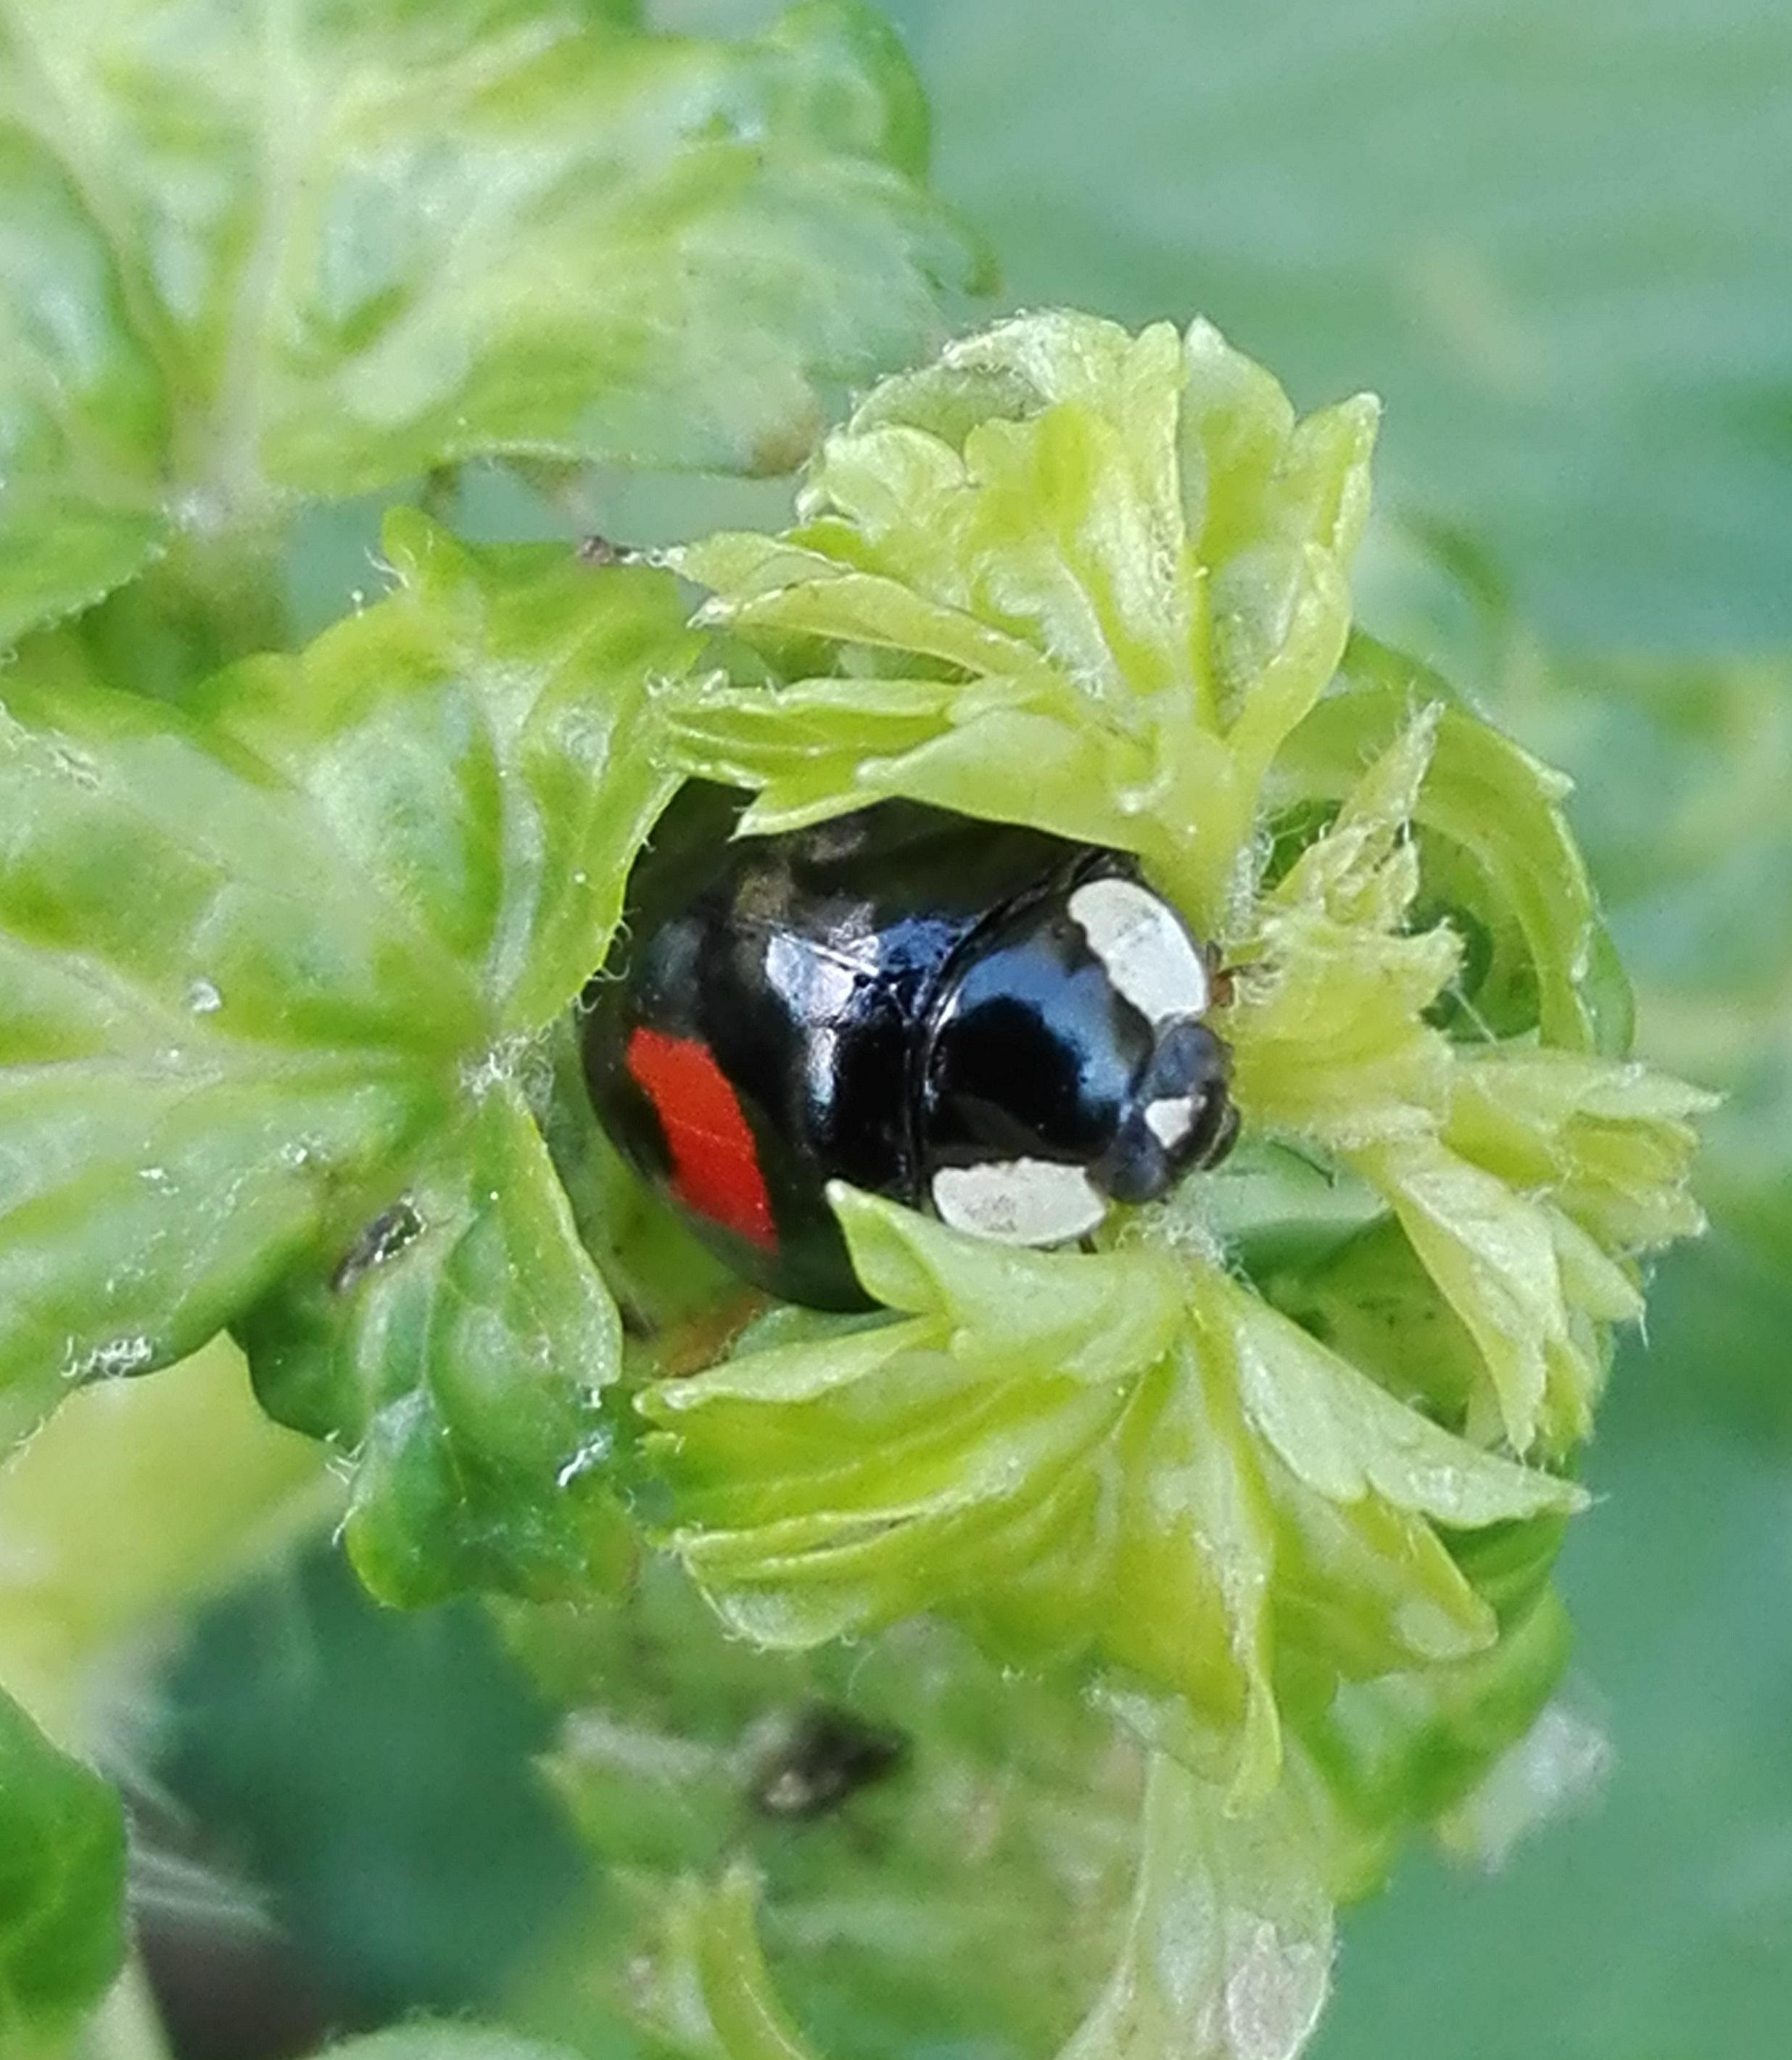 #124 Harlequin Ladybird (Harmonia axyridis)